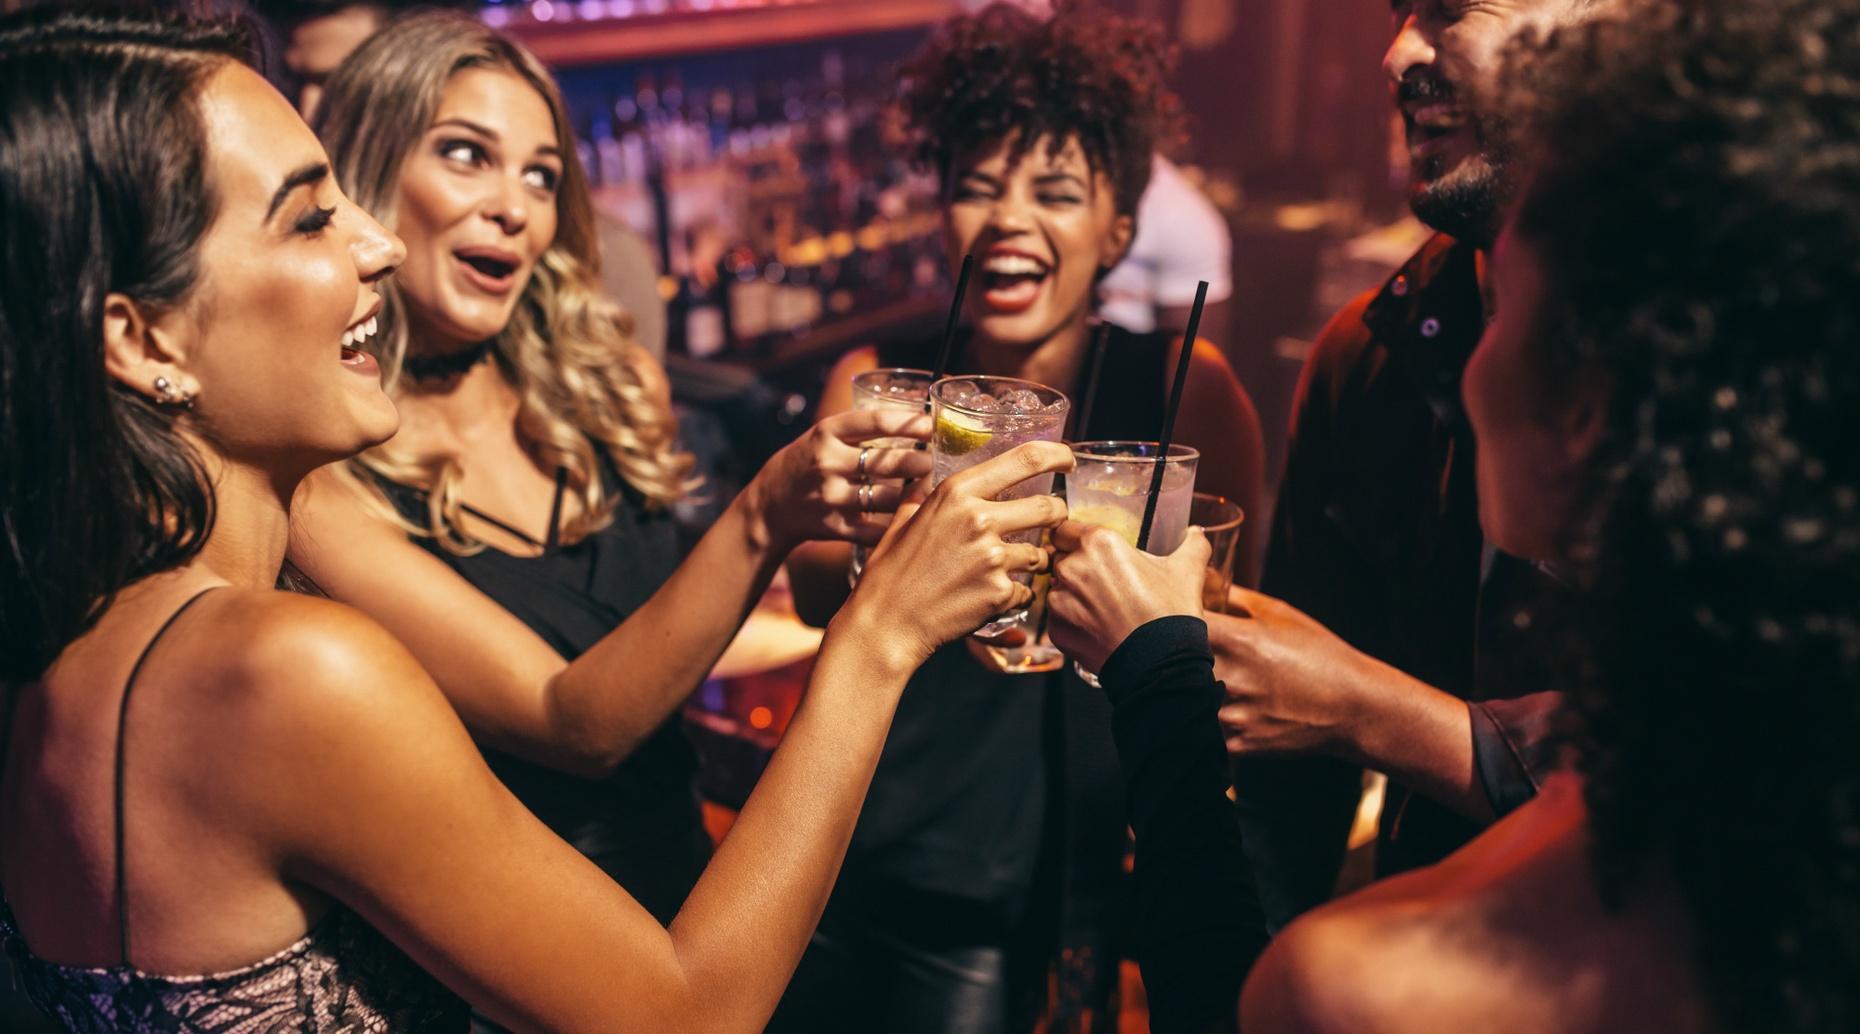 Guided Pub Crawl Through Bars & Nightclubs in Shoreditch, London